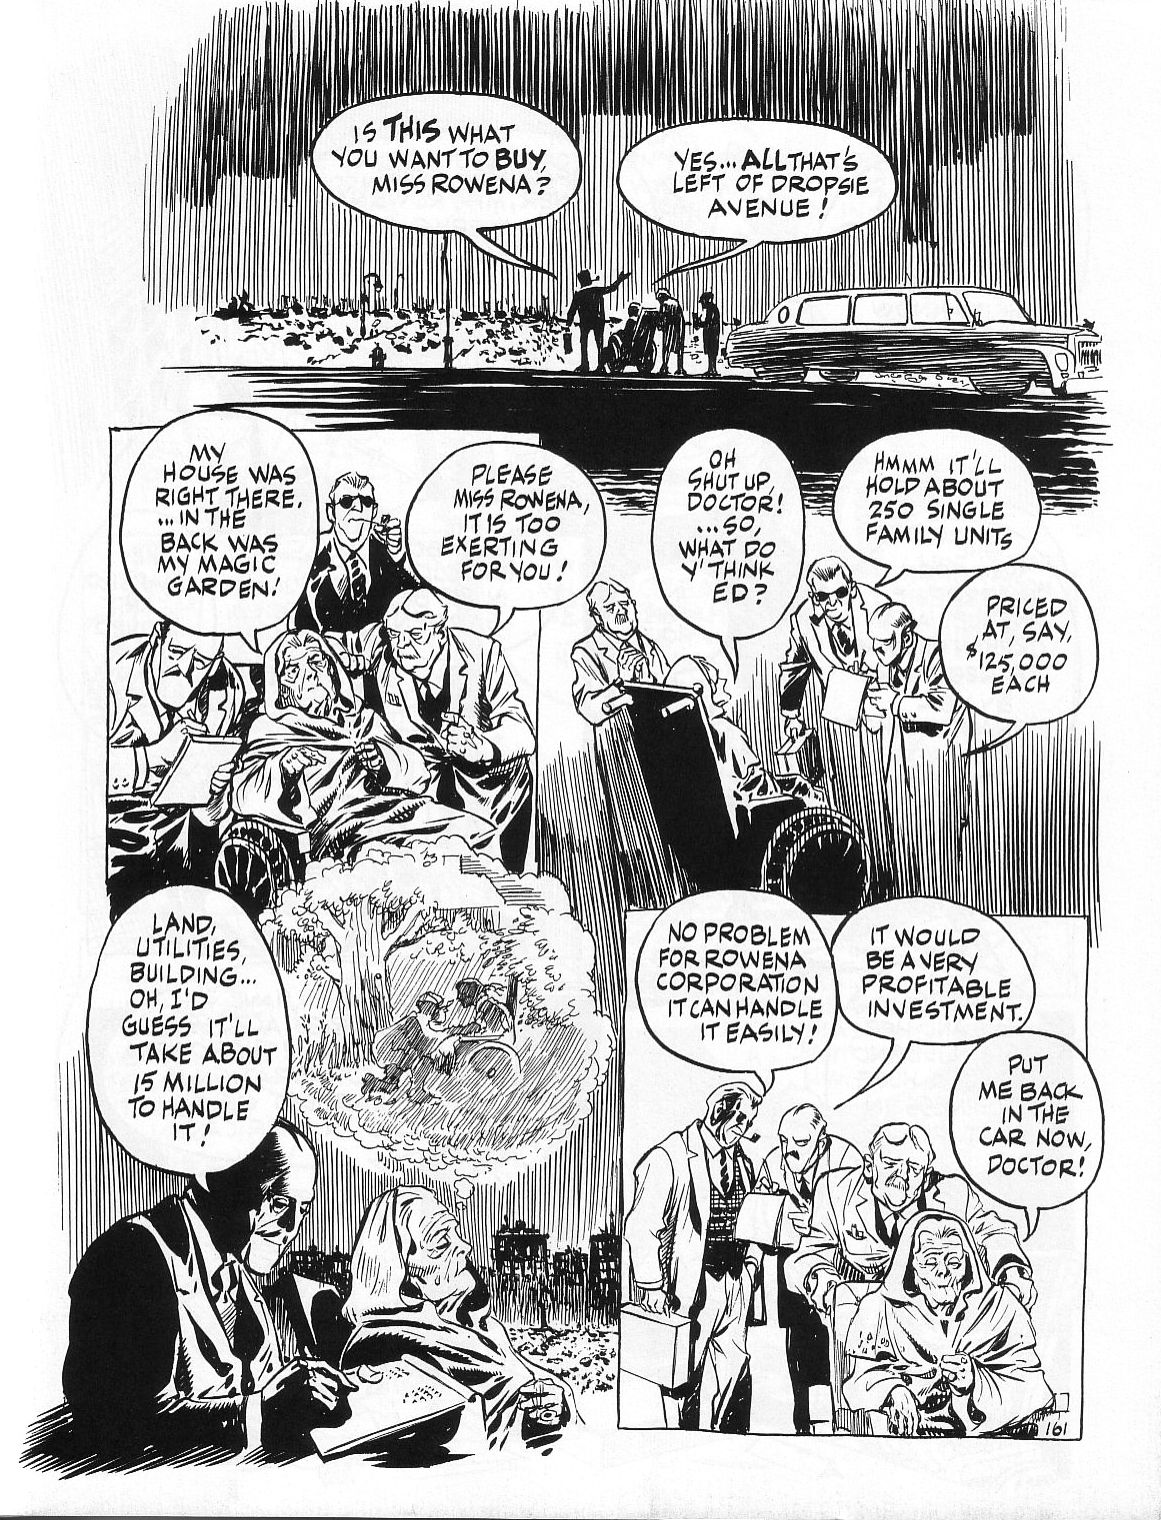 Read online Dropsie Avenue, The Neighborhood comic -  Issue # Full - 163